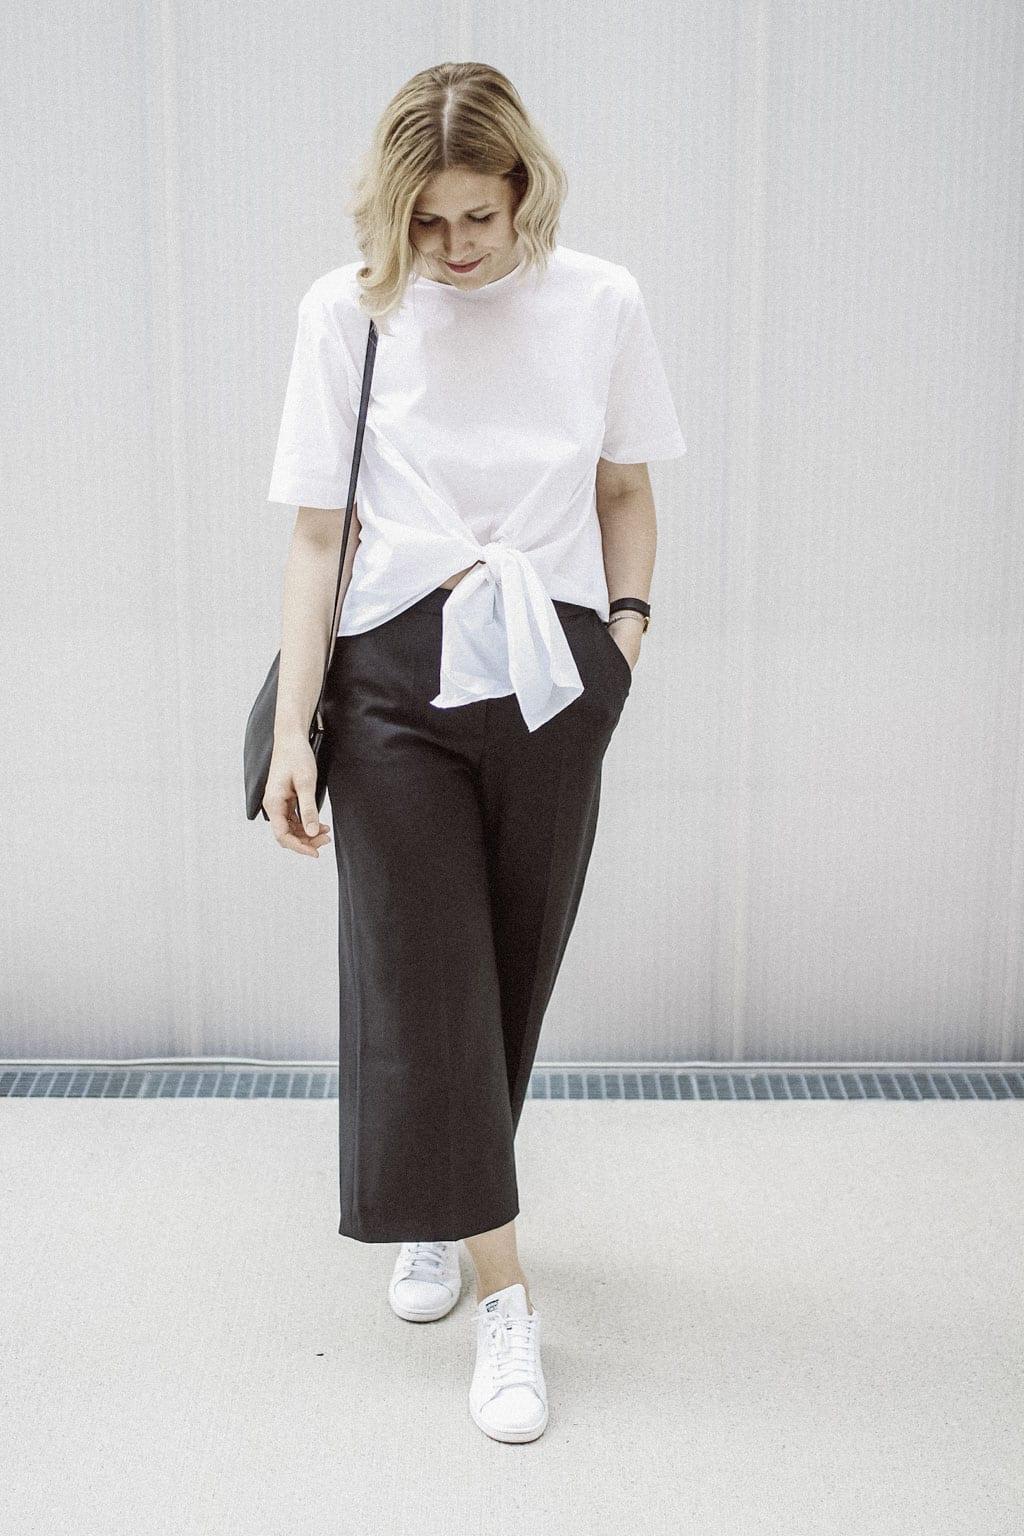 Constantly-K-tifmys-fashion-street-style-minimalism-blog-salzburg-blogger-anna-1972